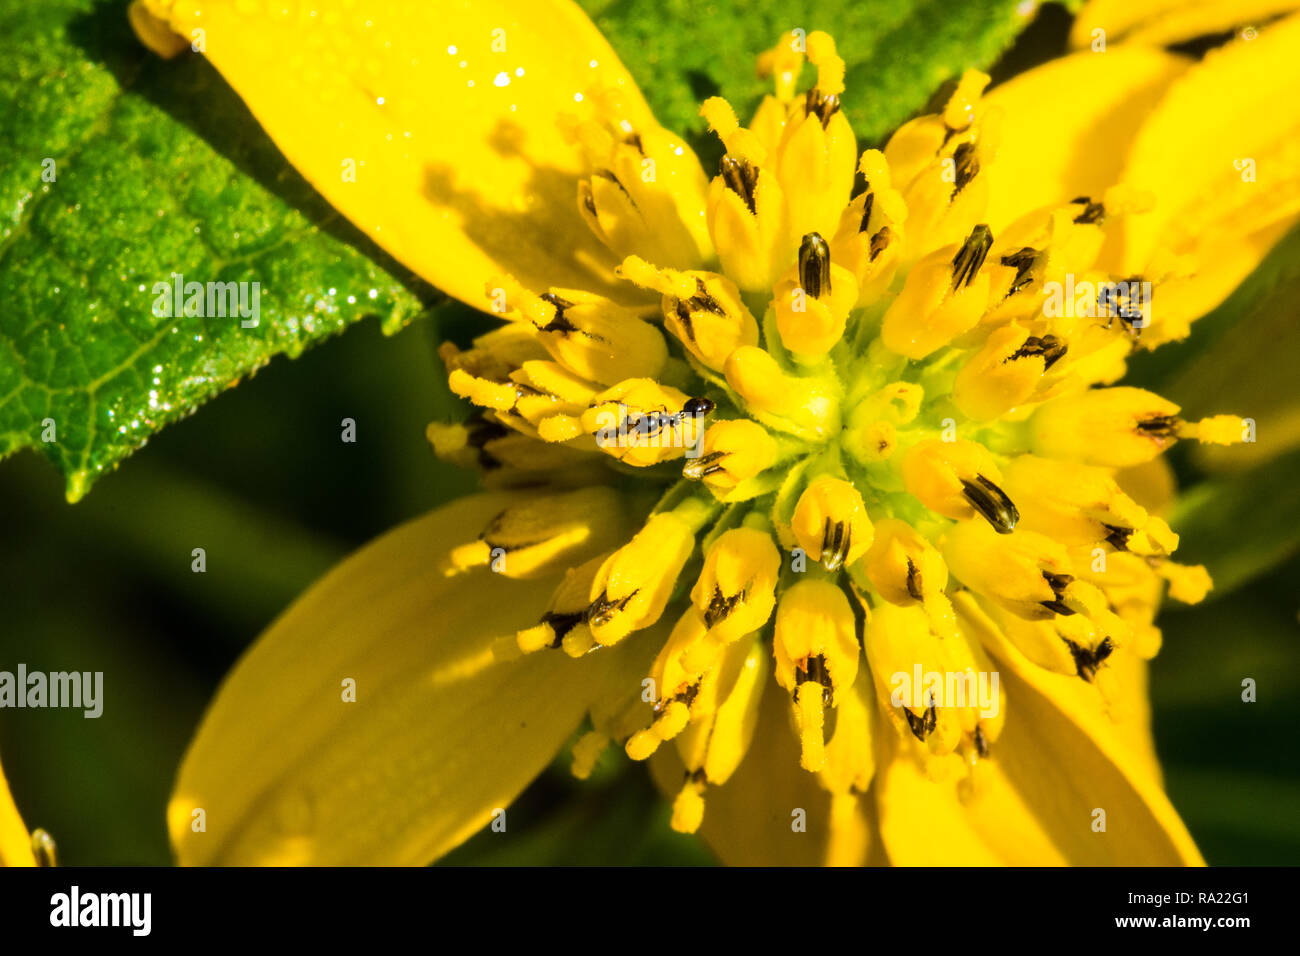 Wildflower pollinator Rudbeckia lanciniata with ants feeding on stamens - Stock Image